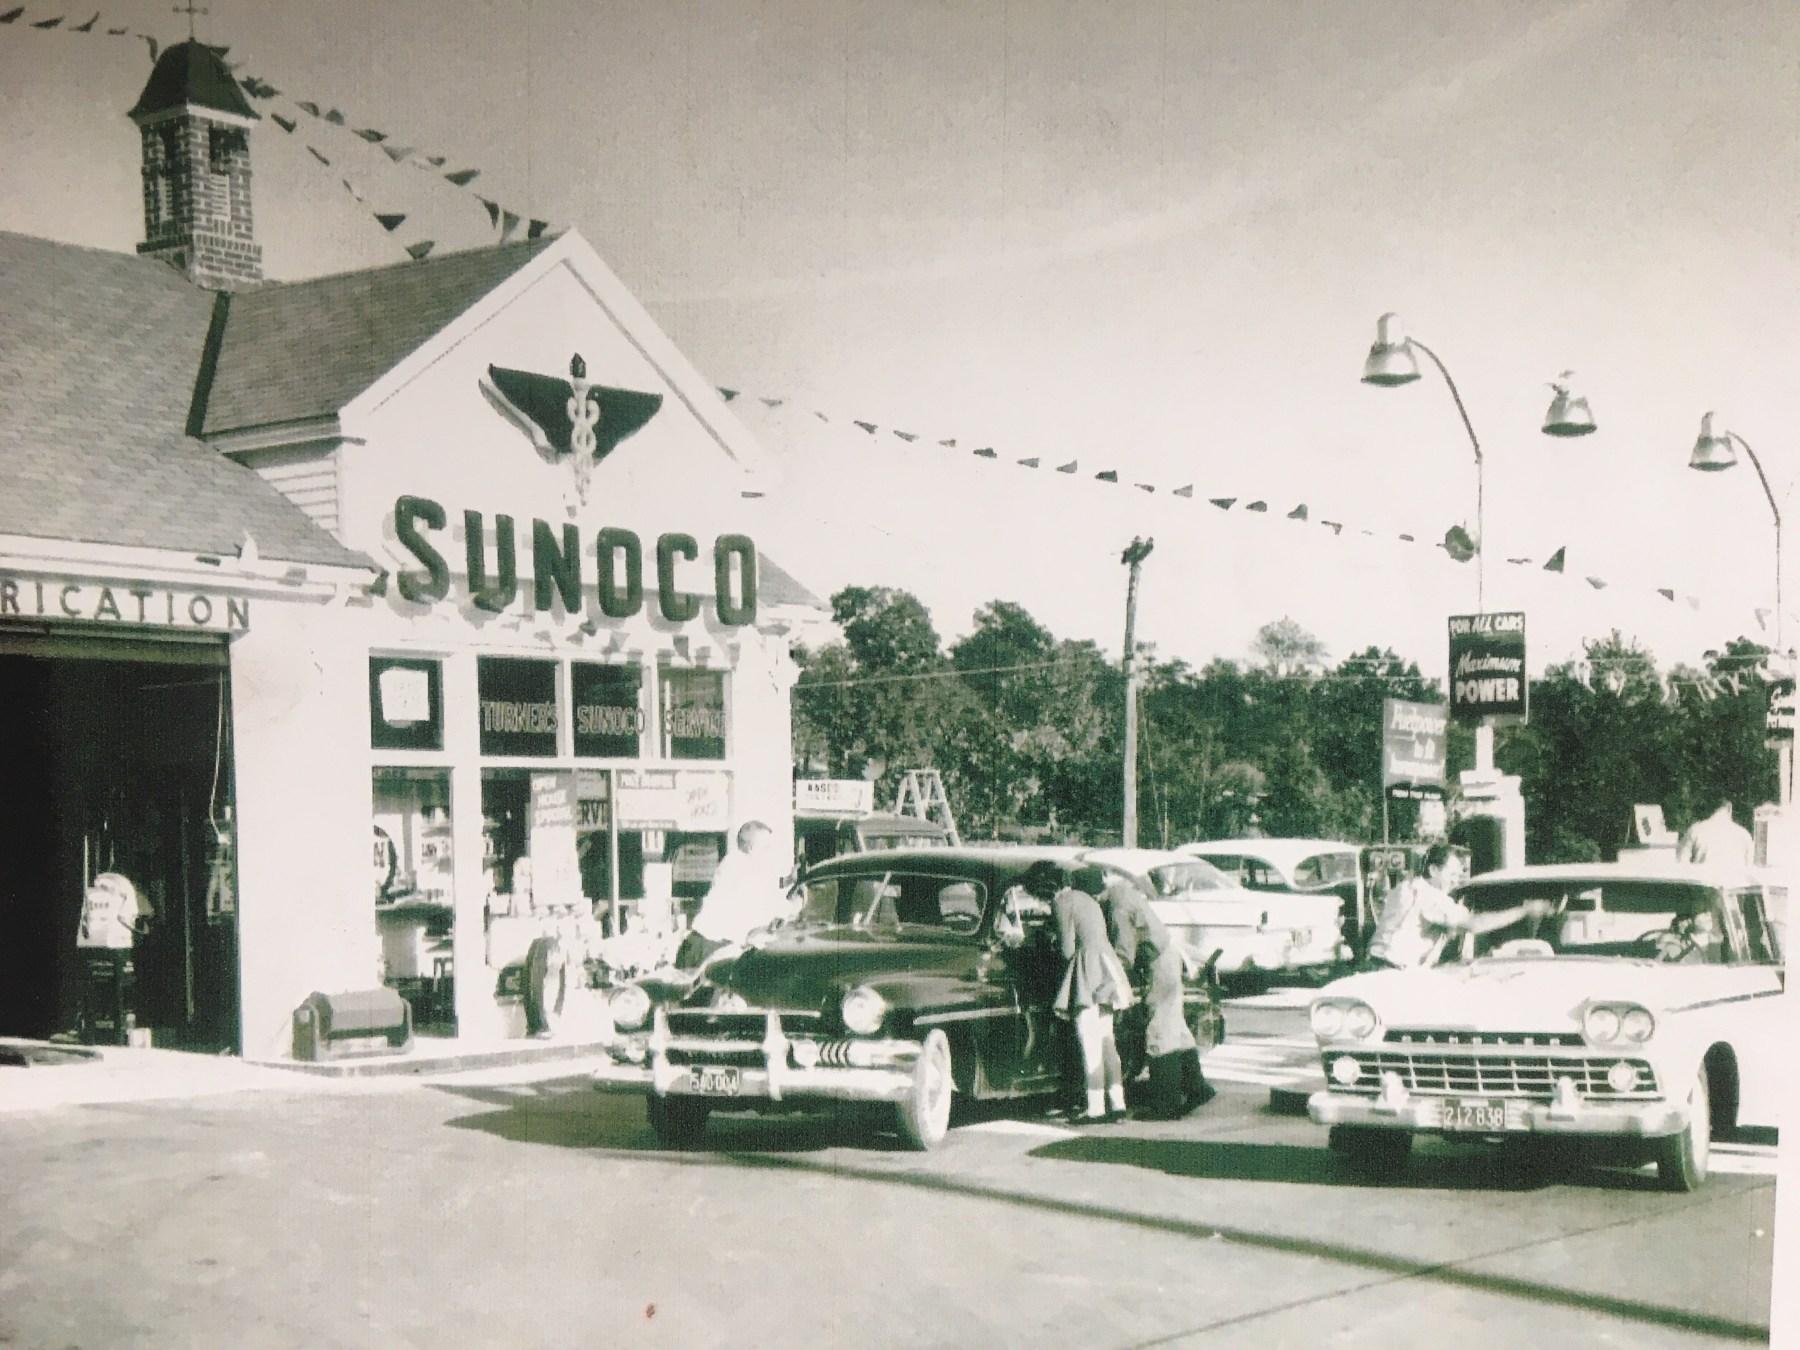 Sunoco newer